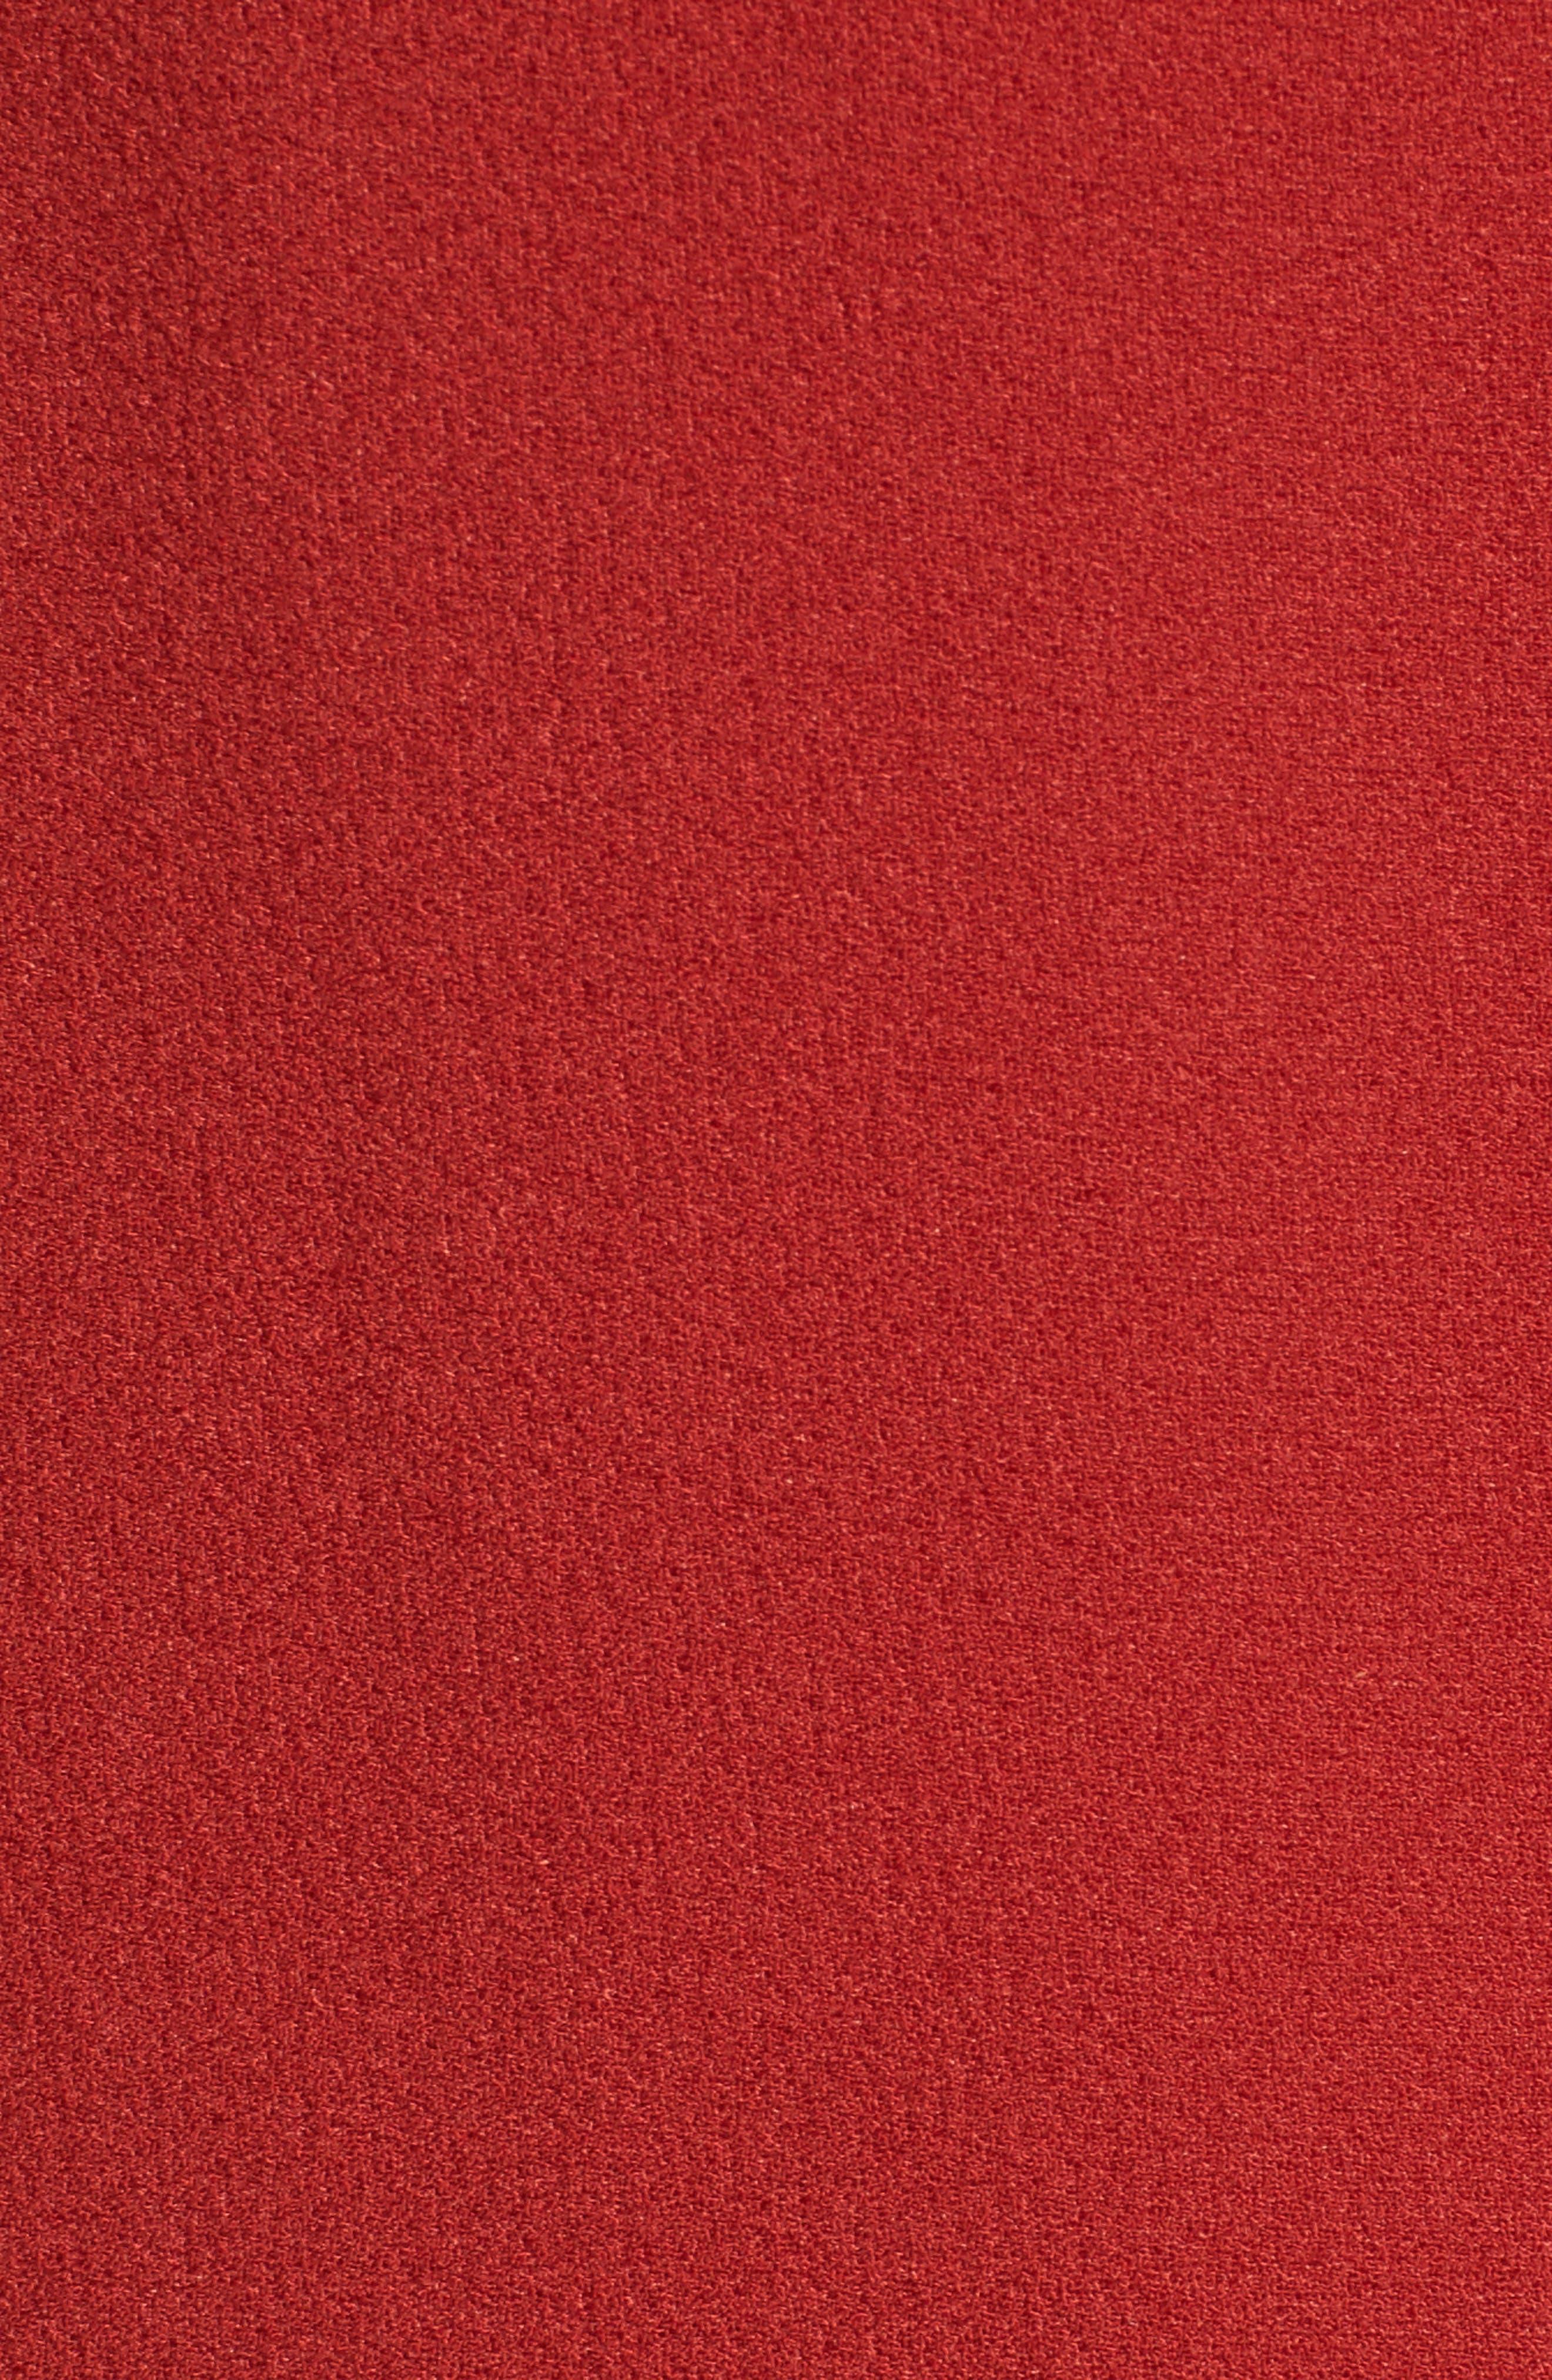 Hailey Crepe Dress,                             Alternate thumbnail 132, color,